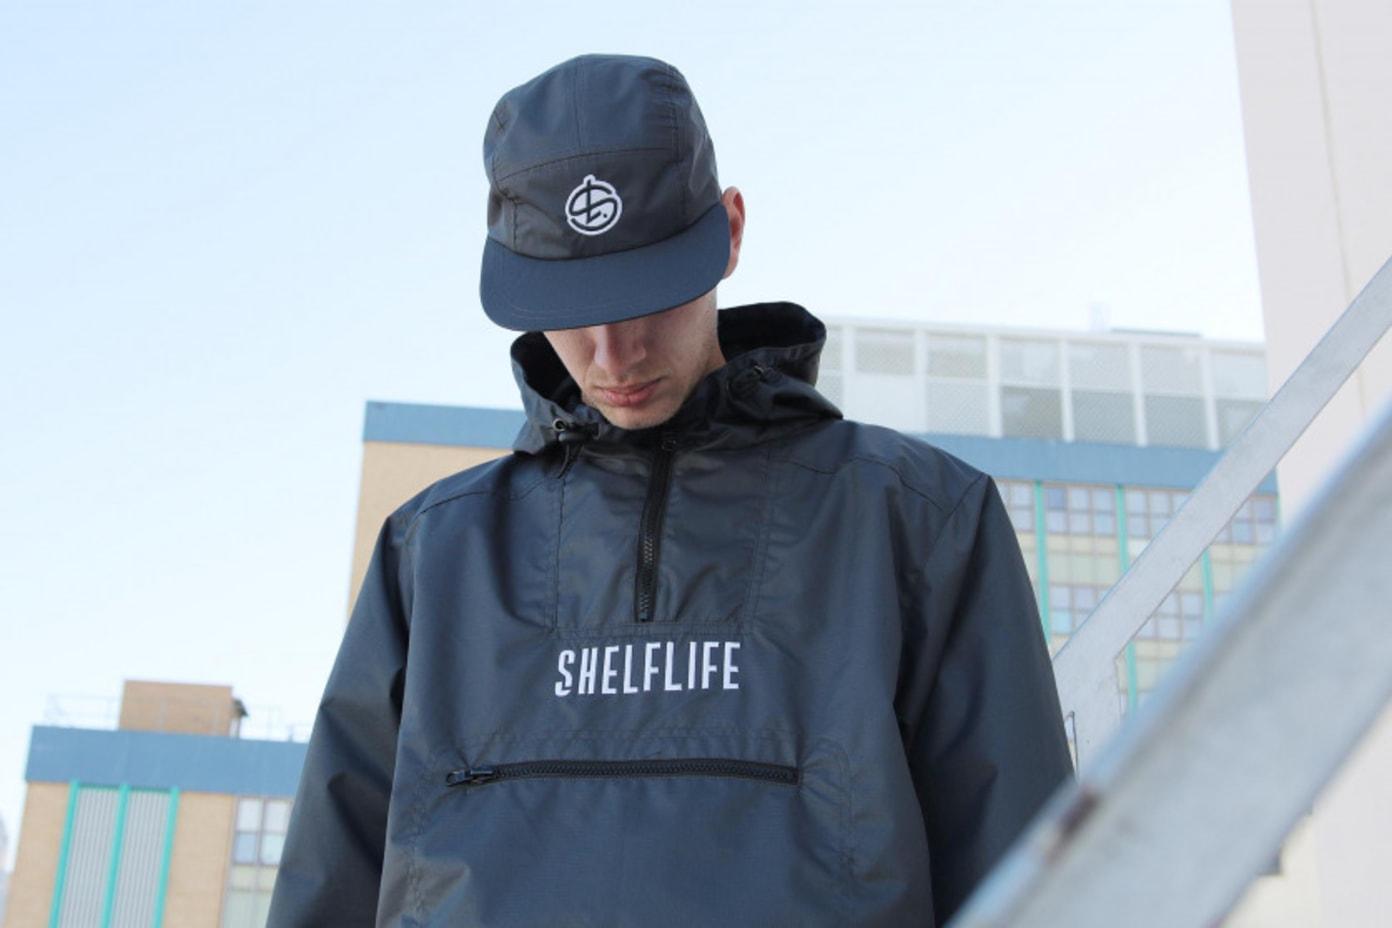 Shelflife Premium Packable Anorak and 5 Panel